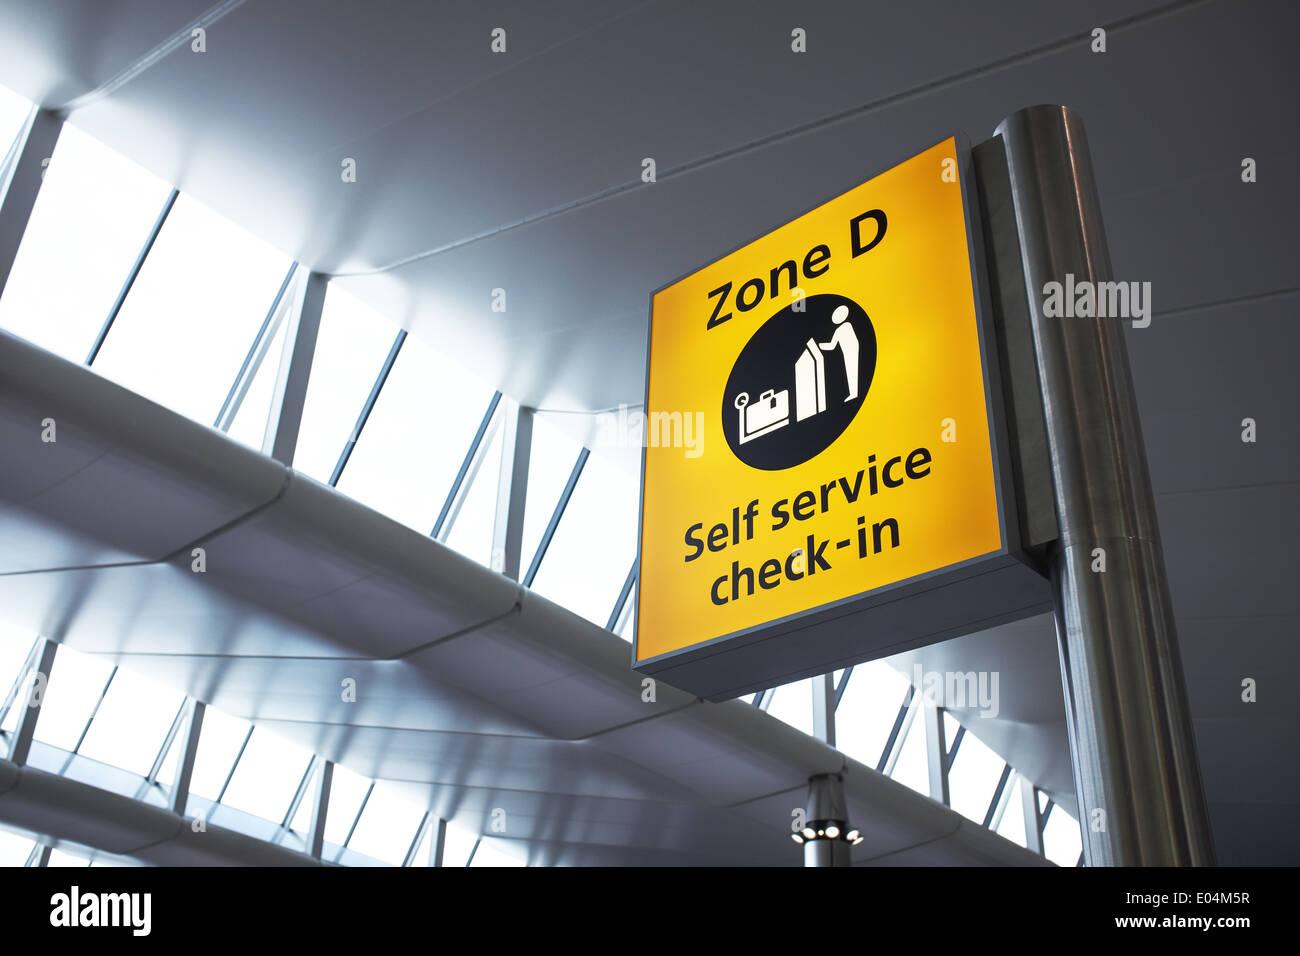 London Heathrow airport terminal 2 interior signage - Stock Image